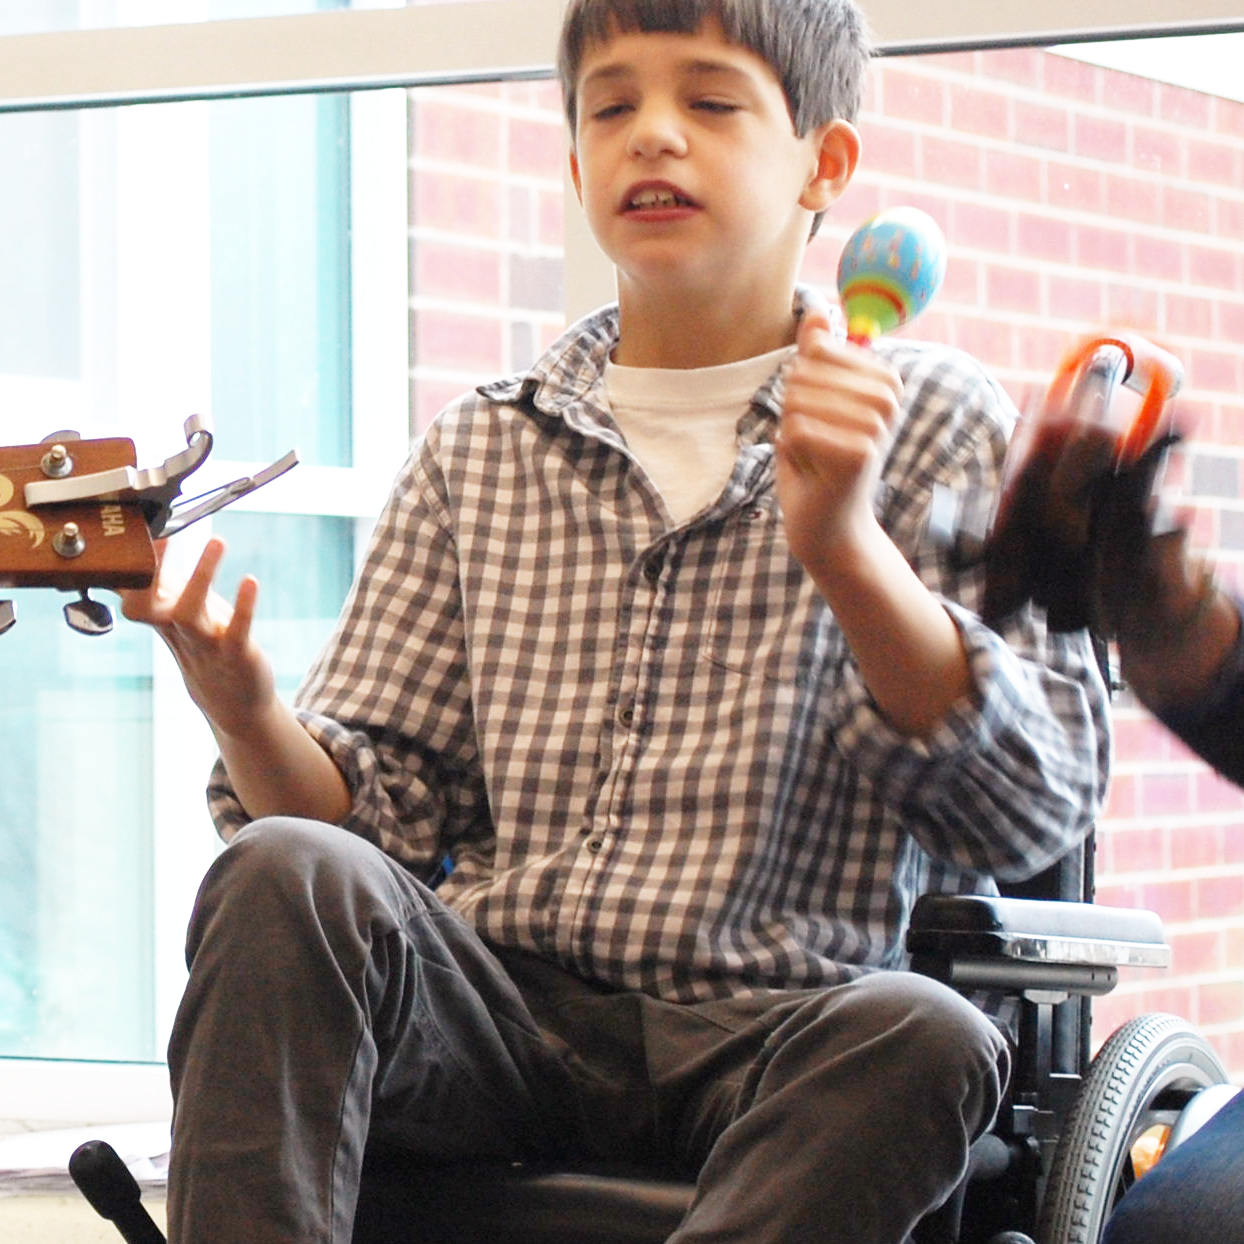 A young CATA artist in a wheelchair playing a maraca